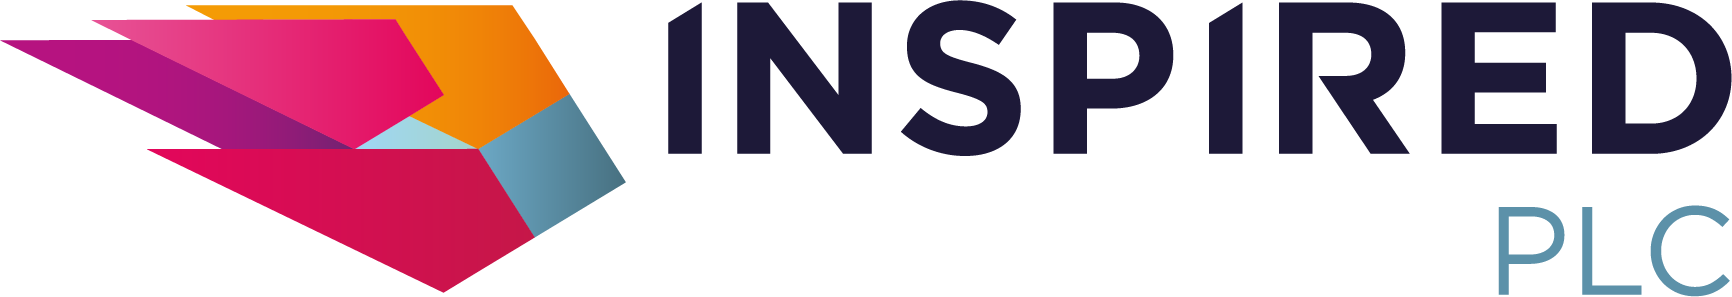 INSPIRED PLC Logo